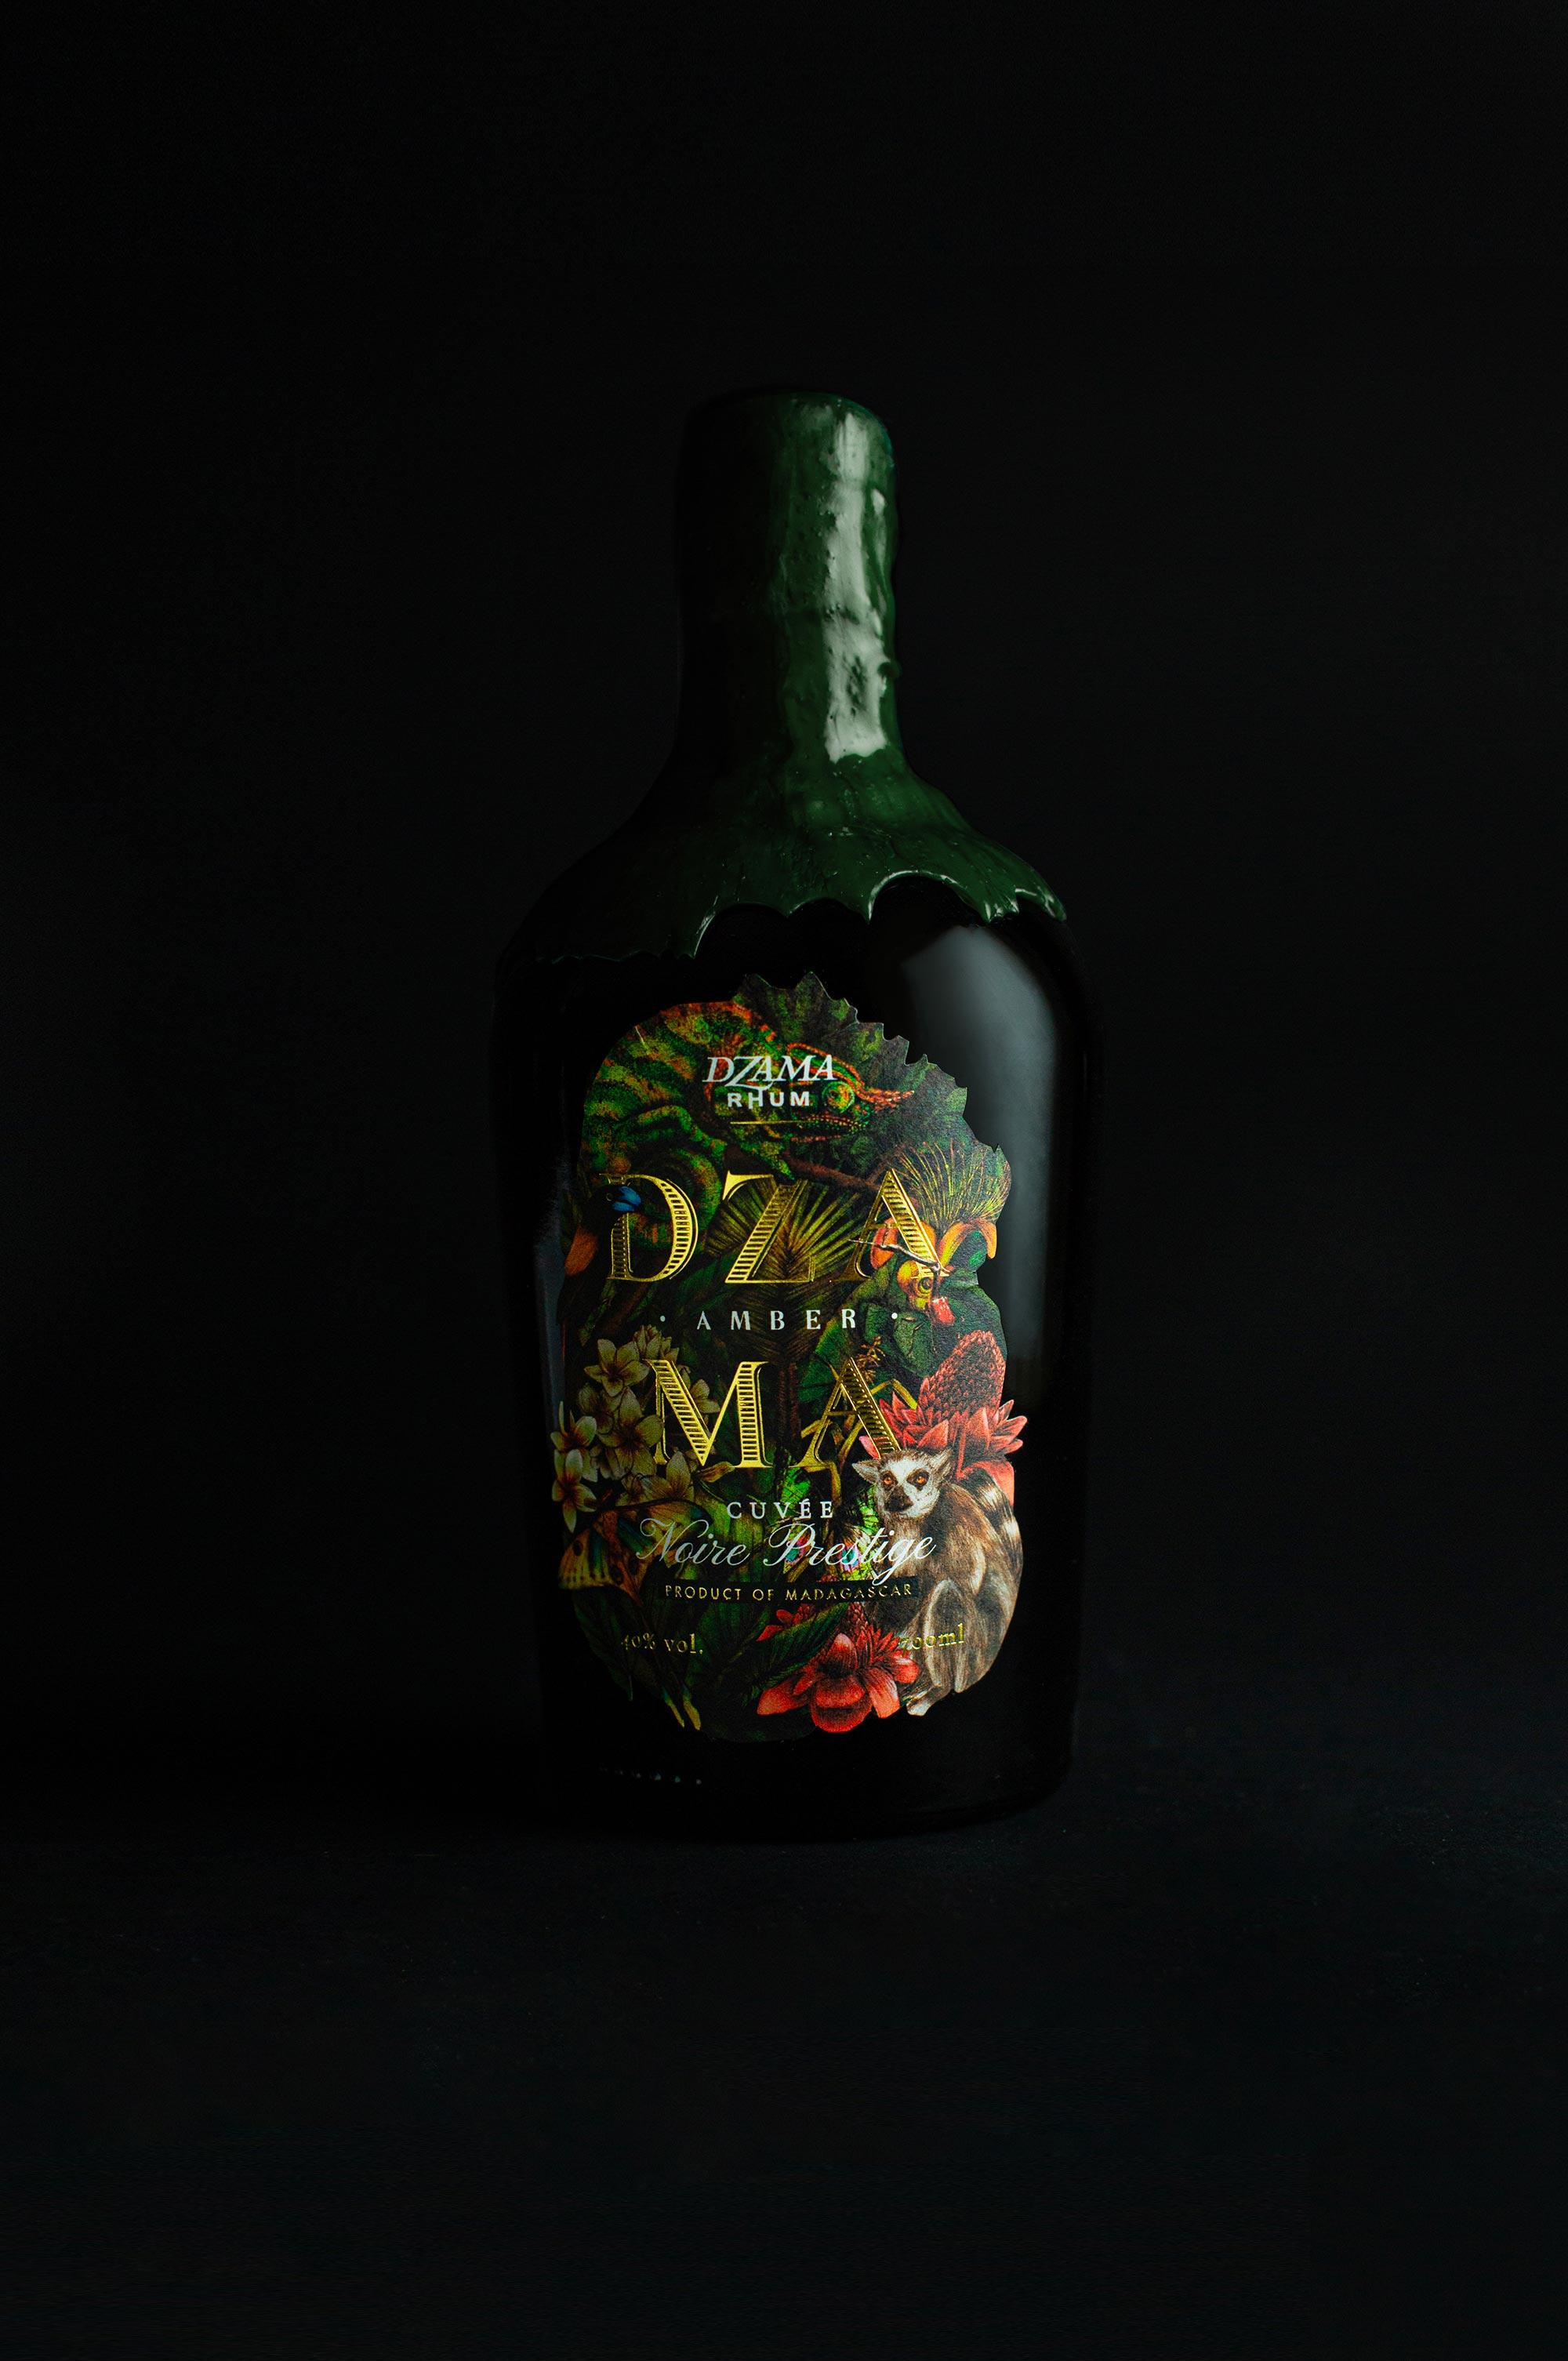 Dzama Rhum Concept Bottle Designed by Studio Boam